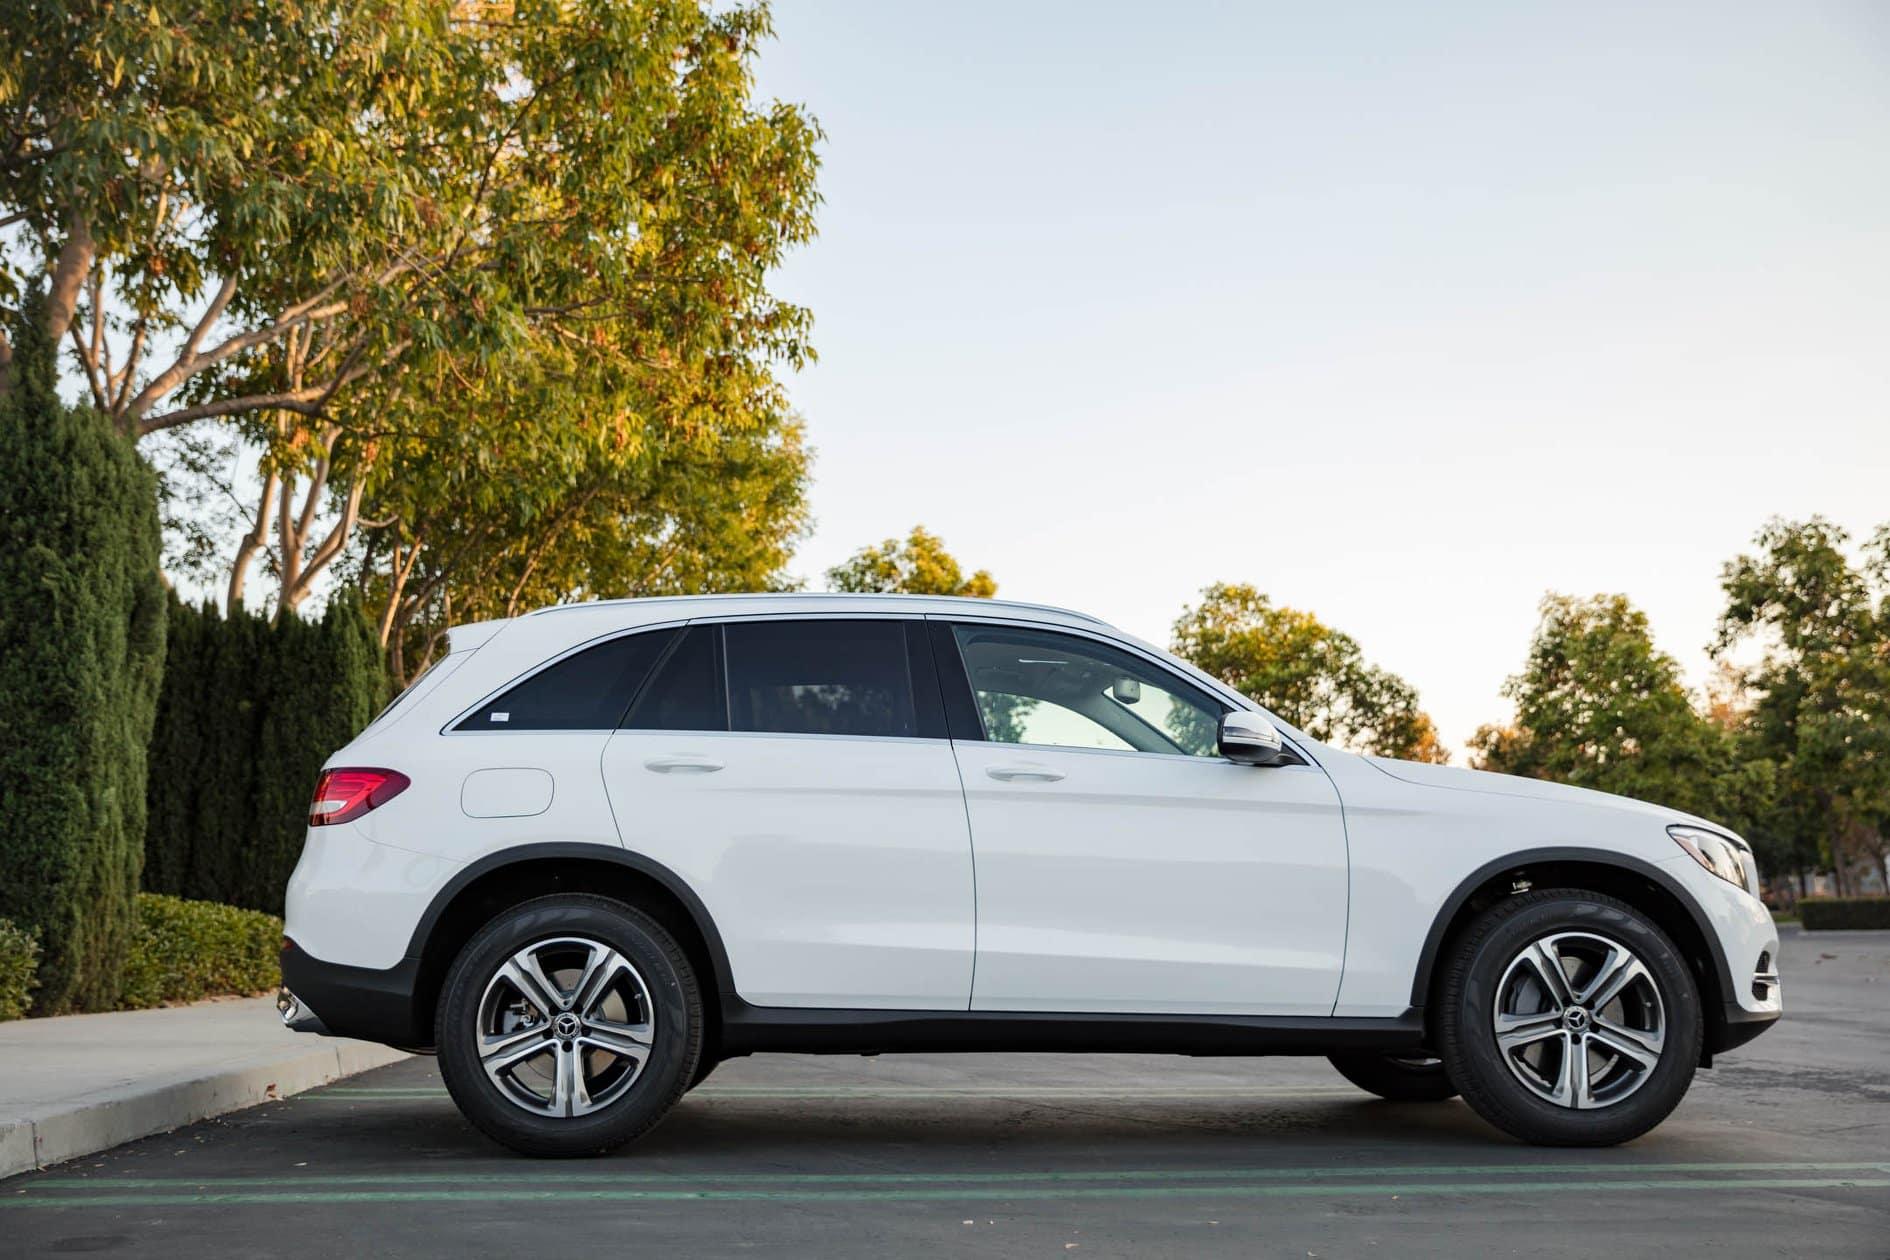 2018 Mercedes-Benz GLC Polar White